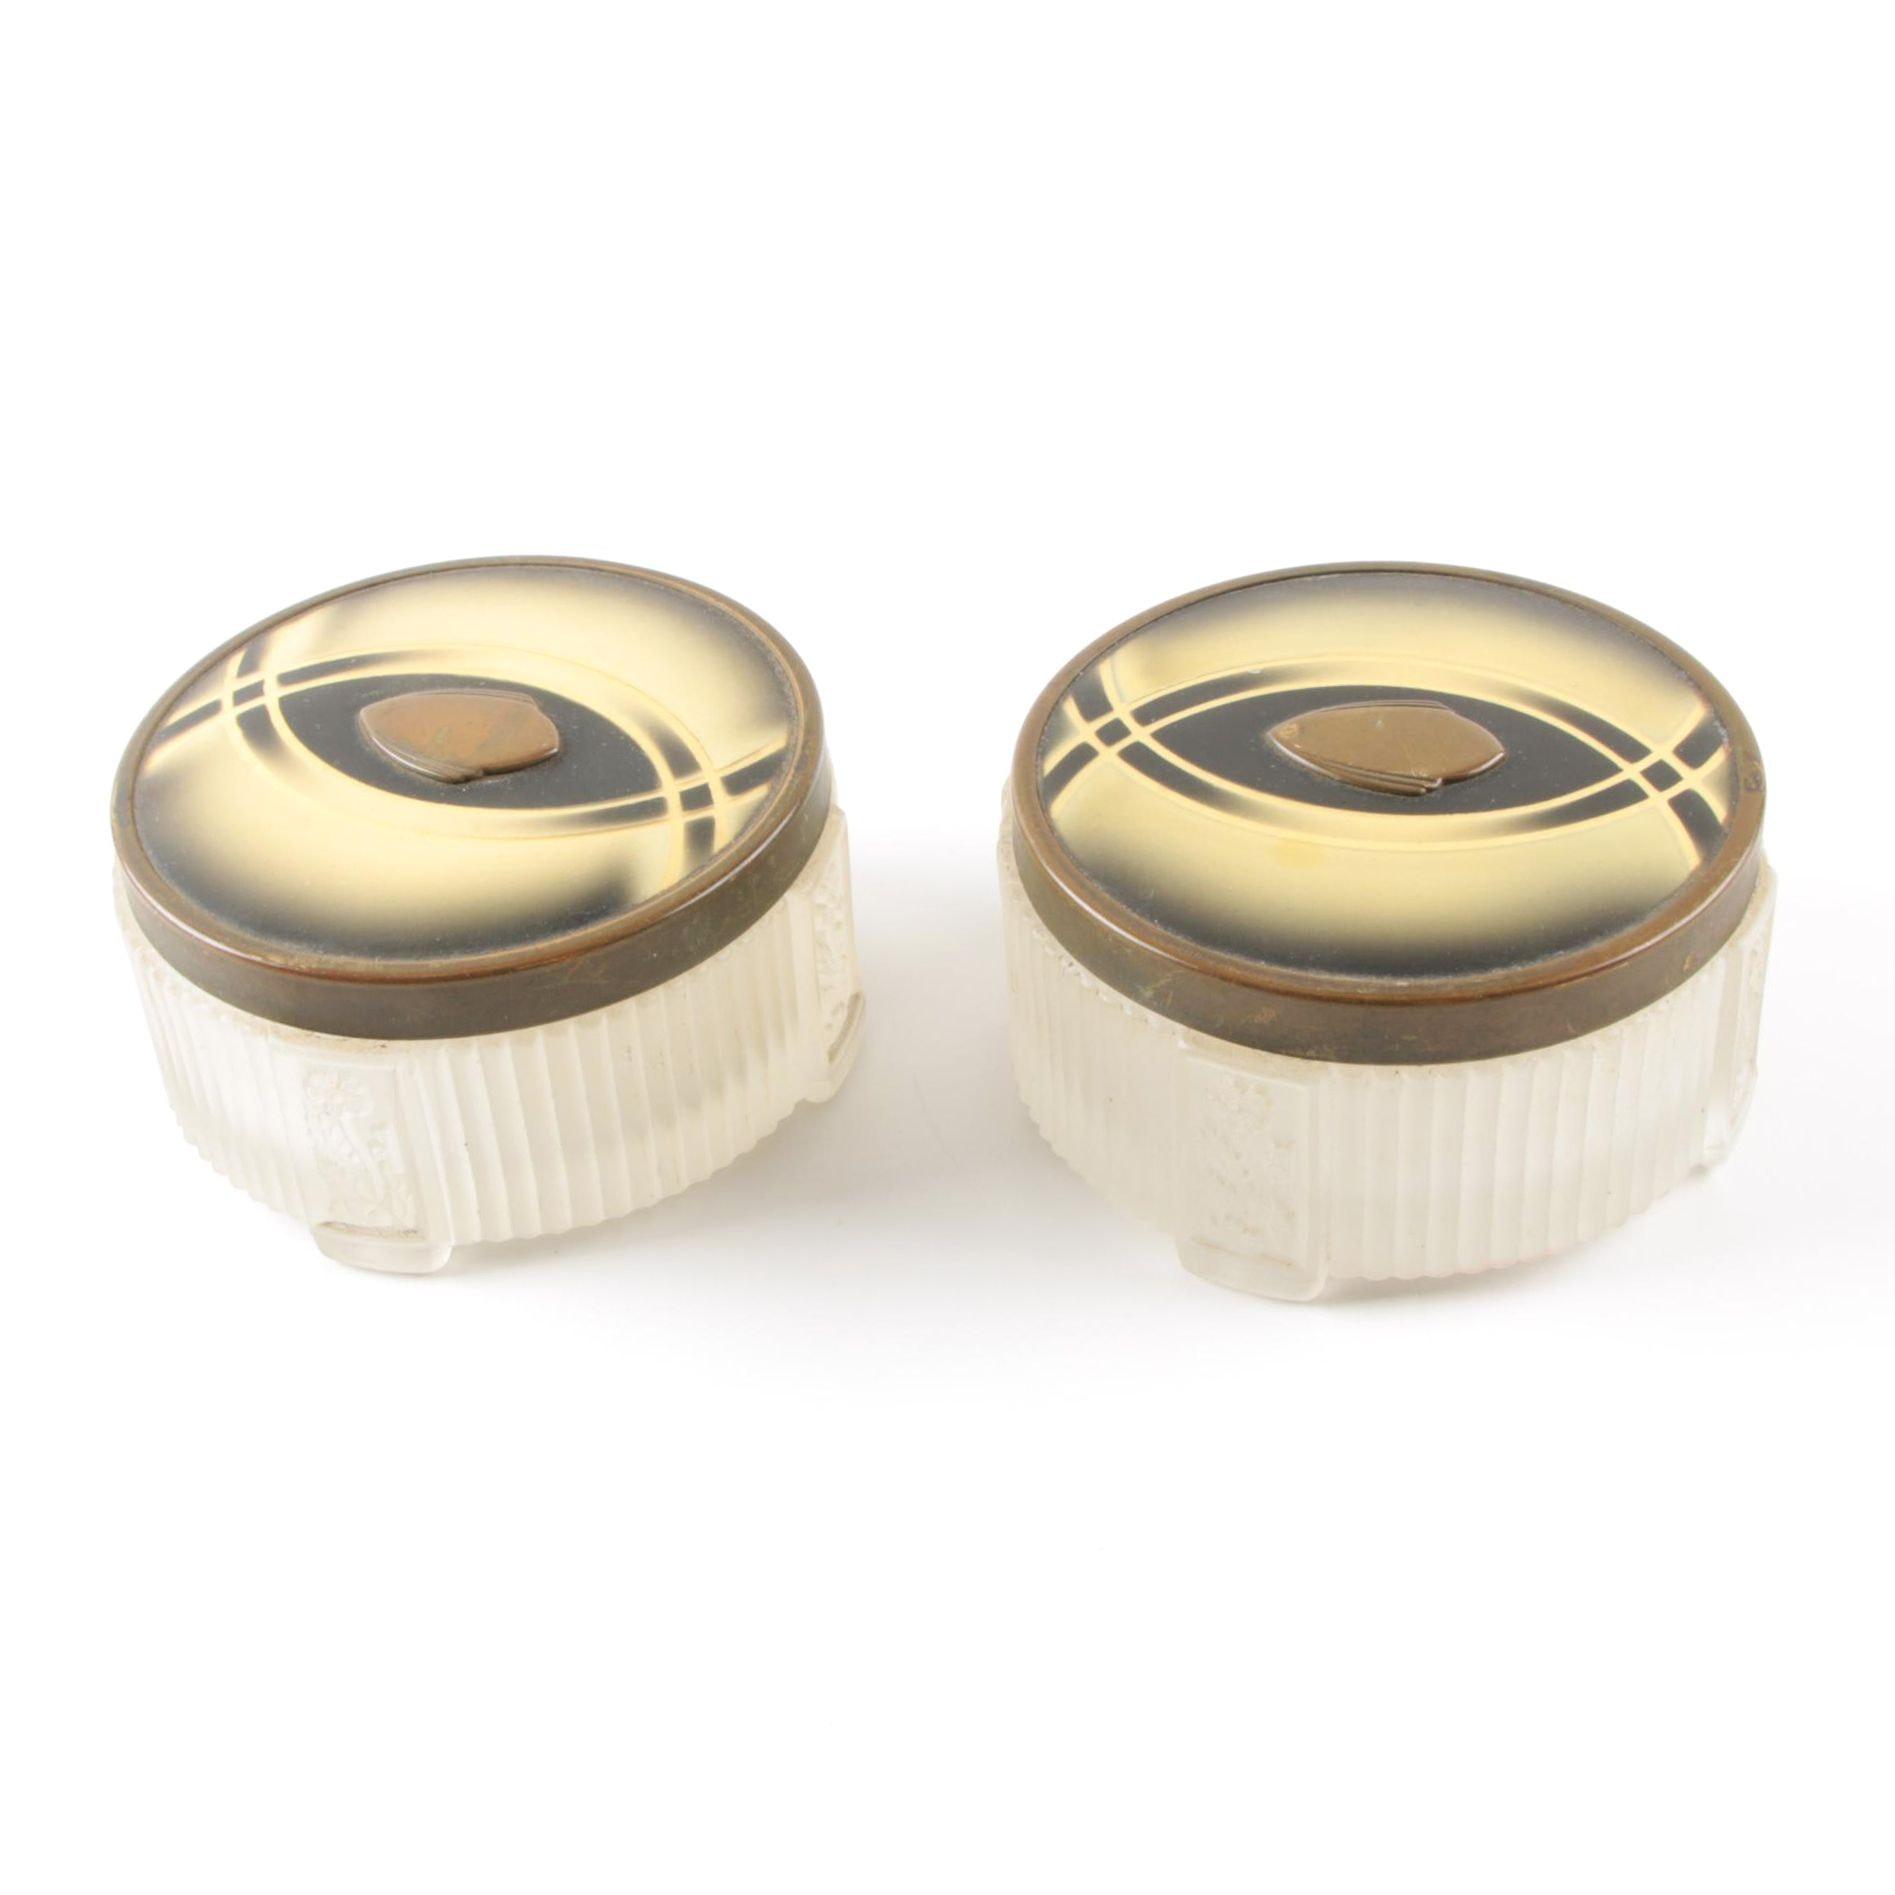 Decorative Art Deco Style Glass Vanity Jars with Metal Lids